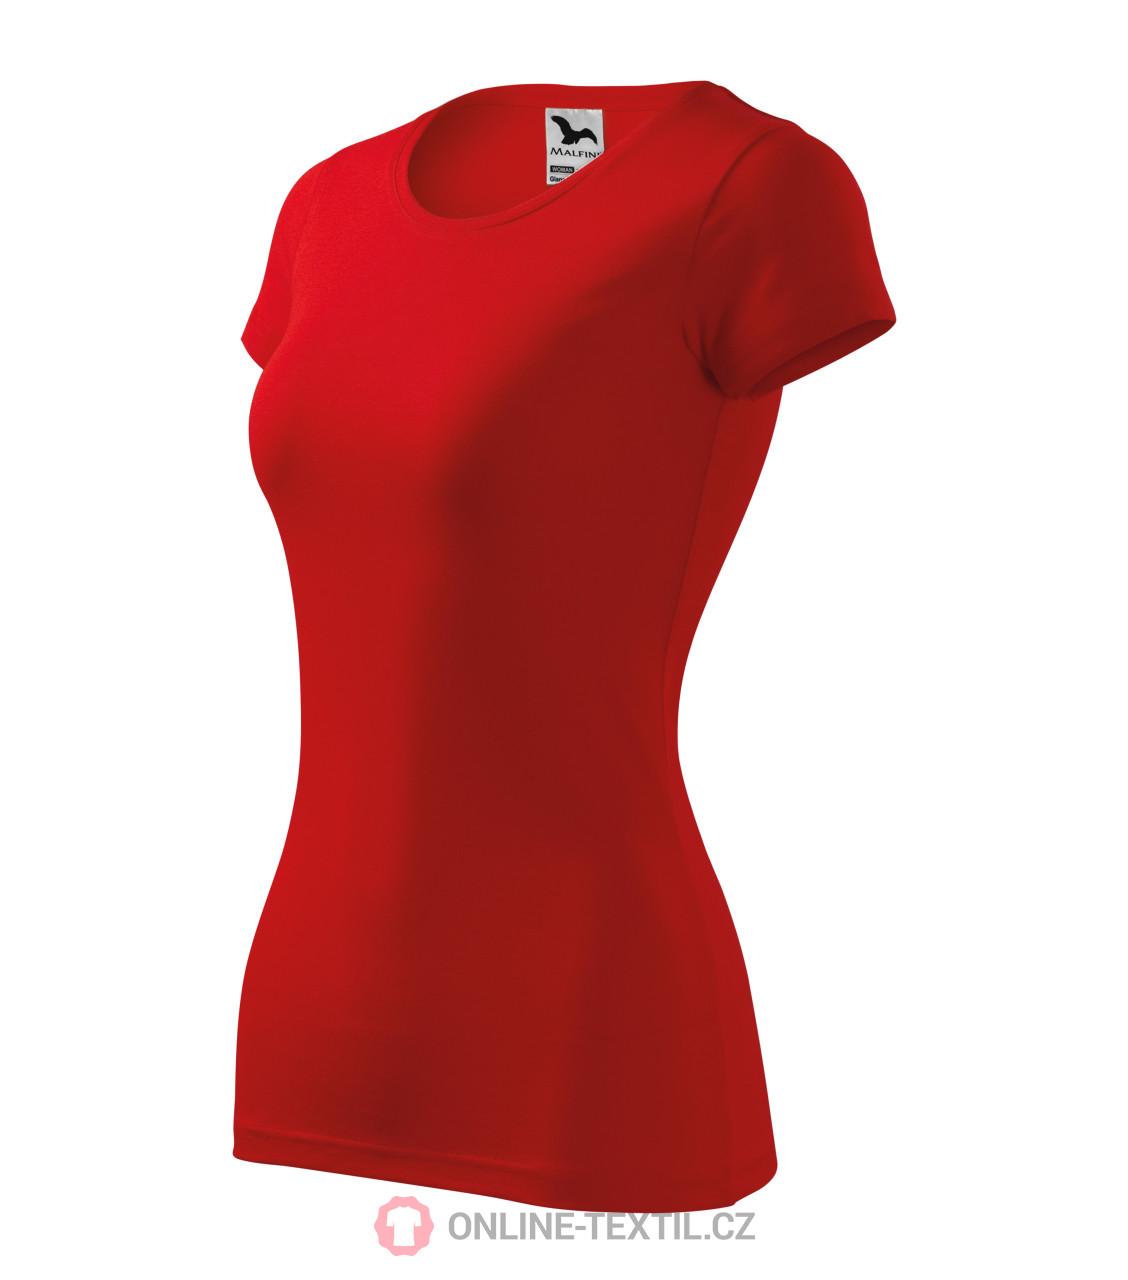 2e394c819 ADLER CZECH Tričko dámske Glance vyššej gramáže 141 - červená z ...